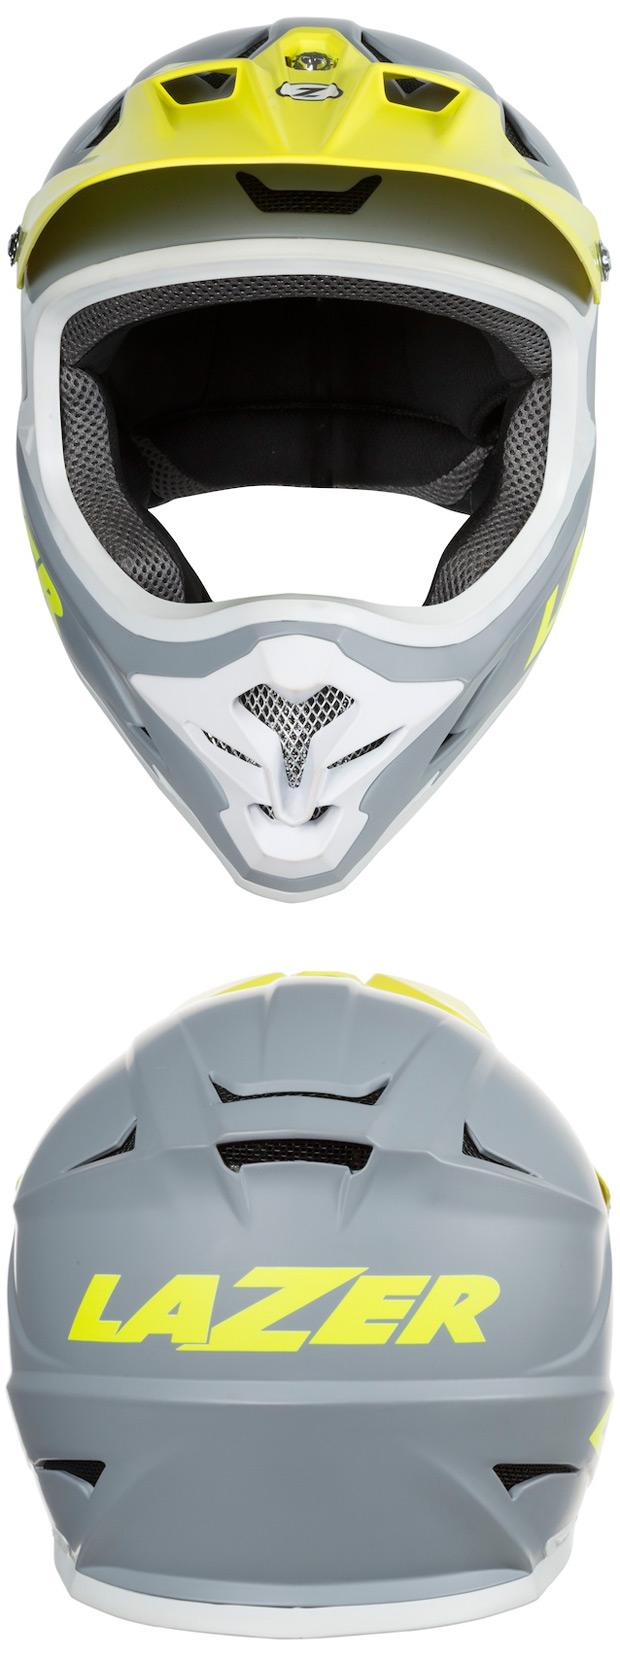 Lazer Phoenix+ de 2016, un casco integral de buena calidad a precio imbatible